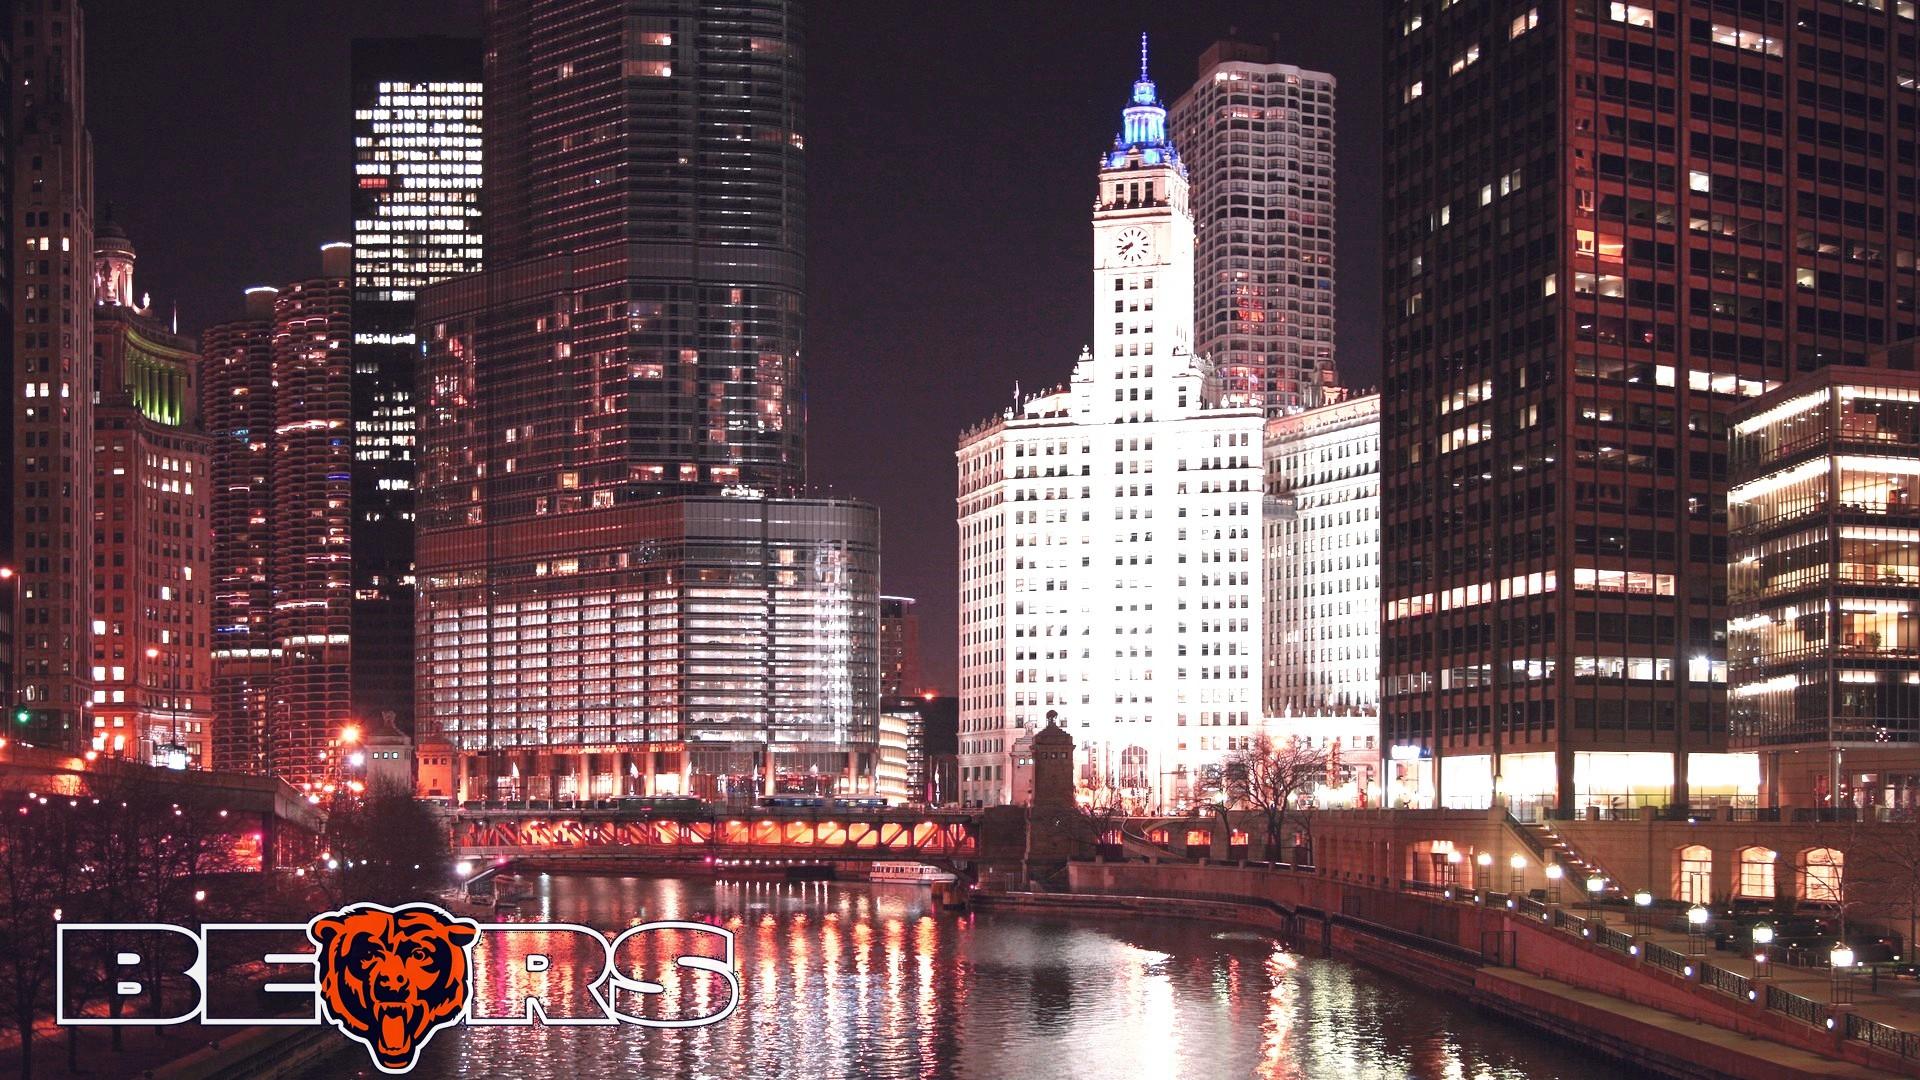 chicago bears wallpaper 1920x1080 1920x1080